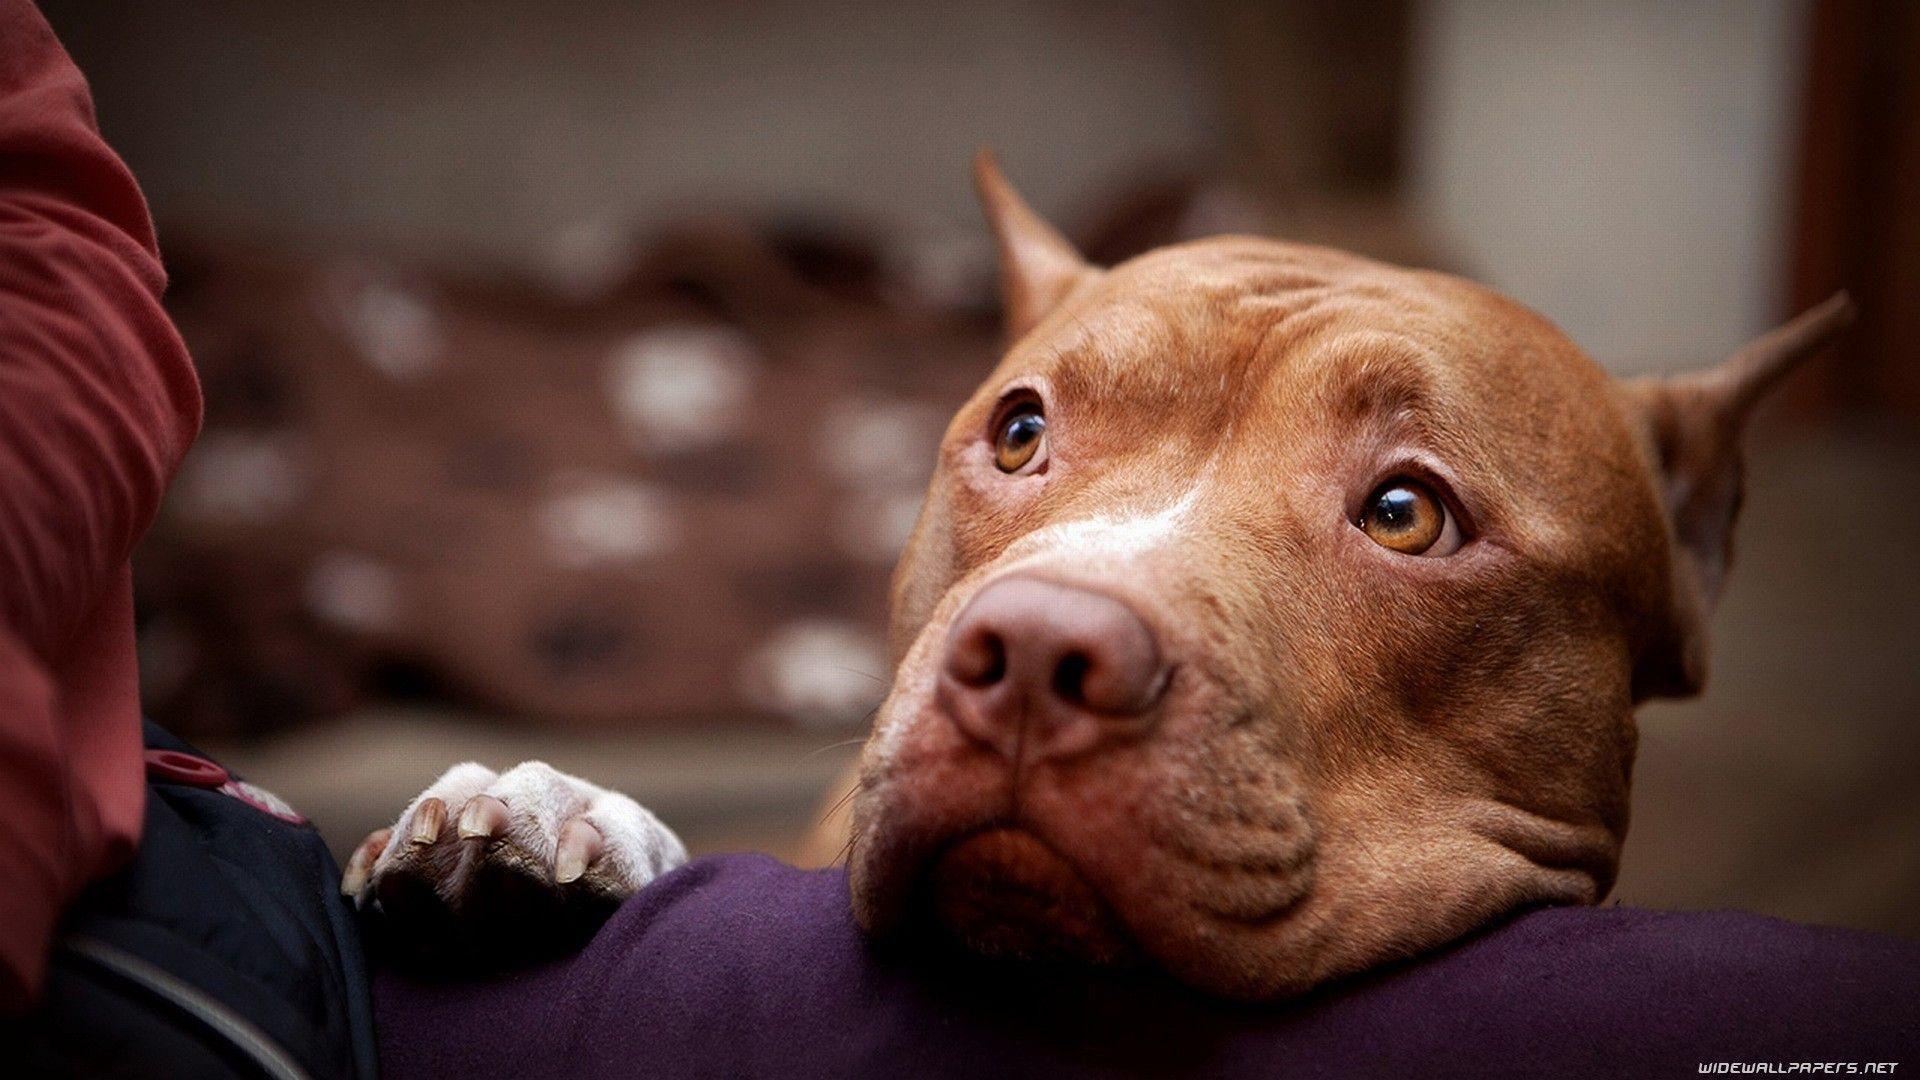 American Pitbull Wallpaper Pitbulls Pitbull Terrier Dogs And Puppies